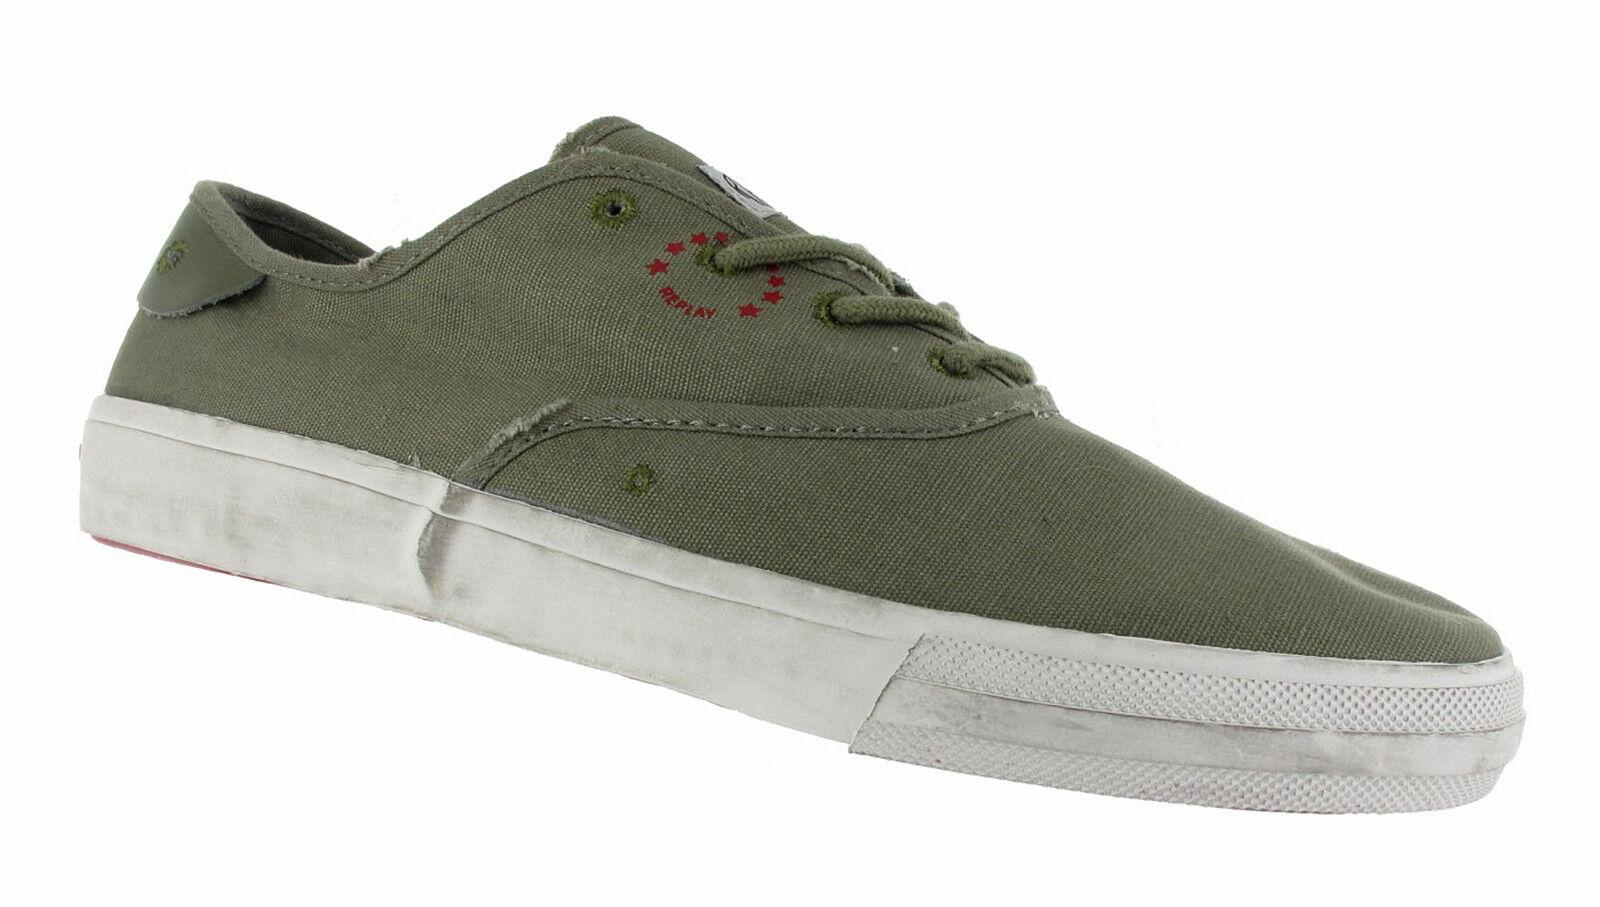 REPLAY Sneaker RV370005T - Pasadena - army RV370005T Sneaker 9b37c7